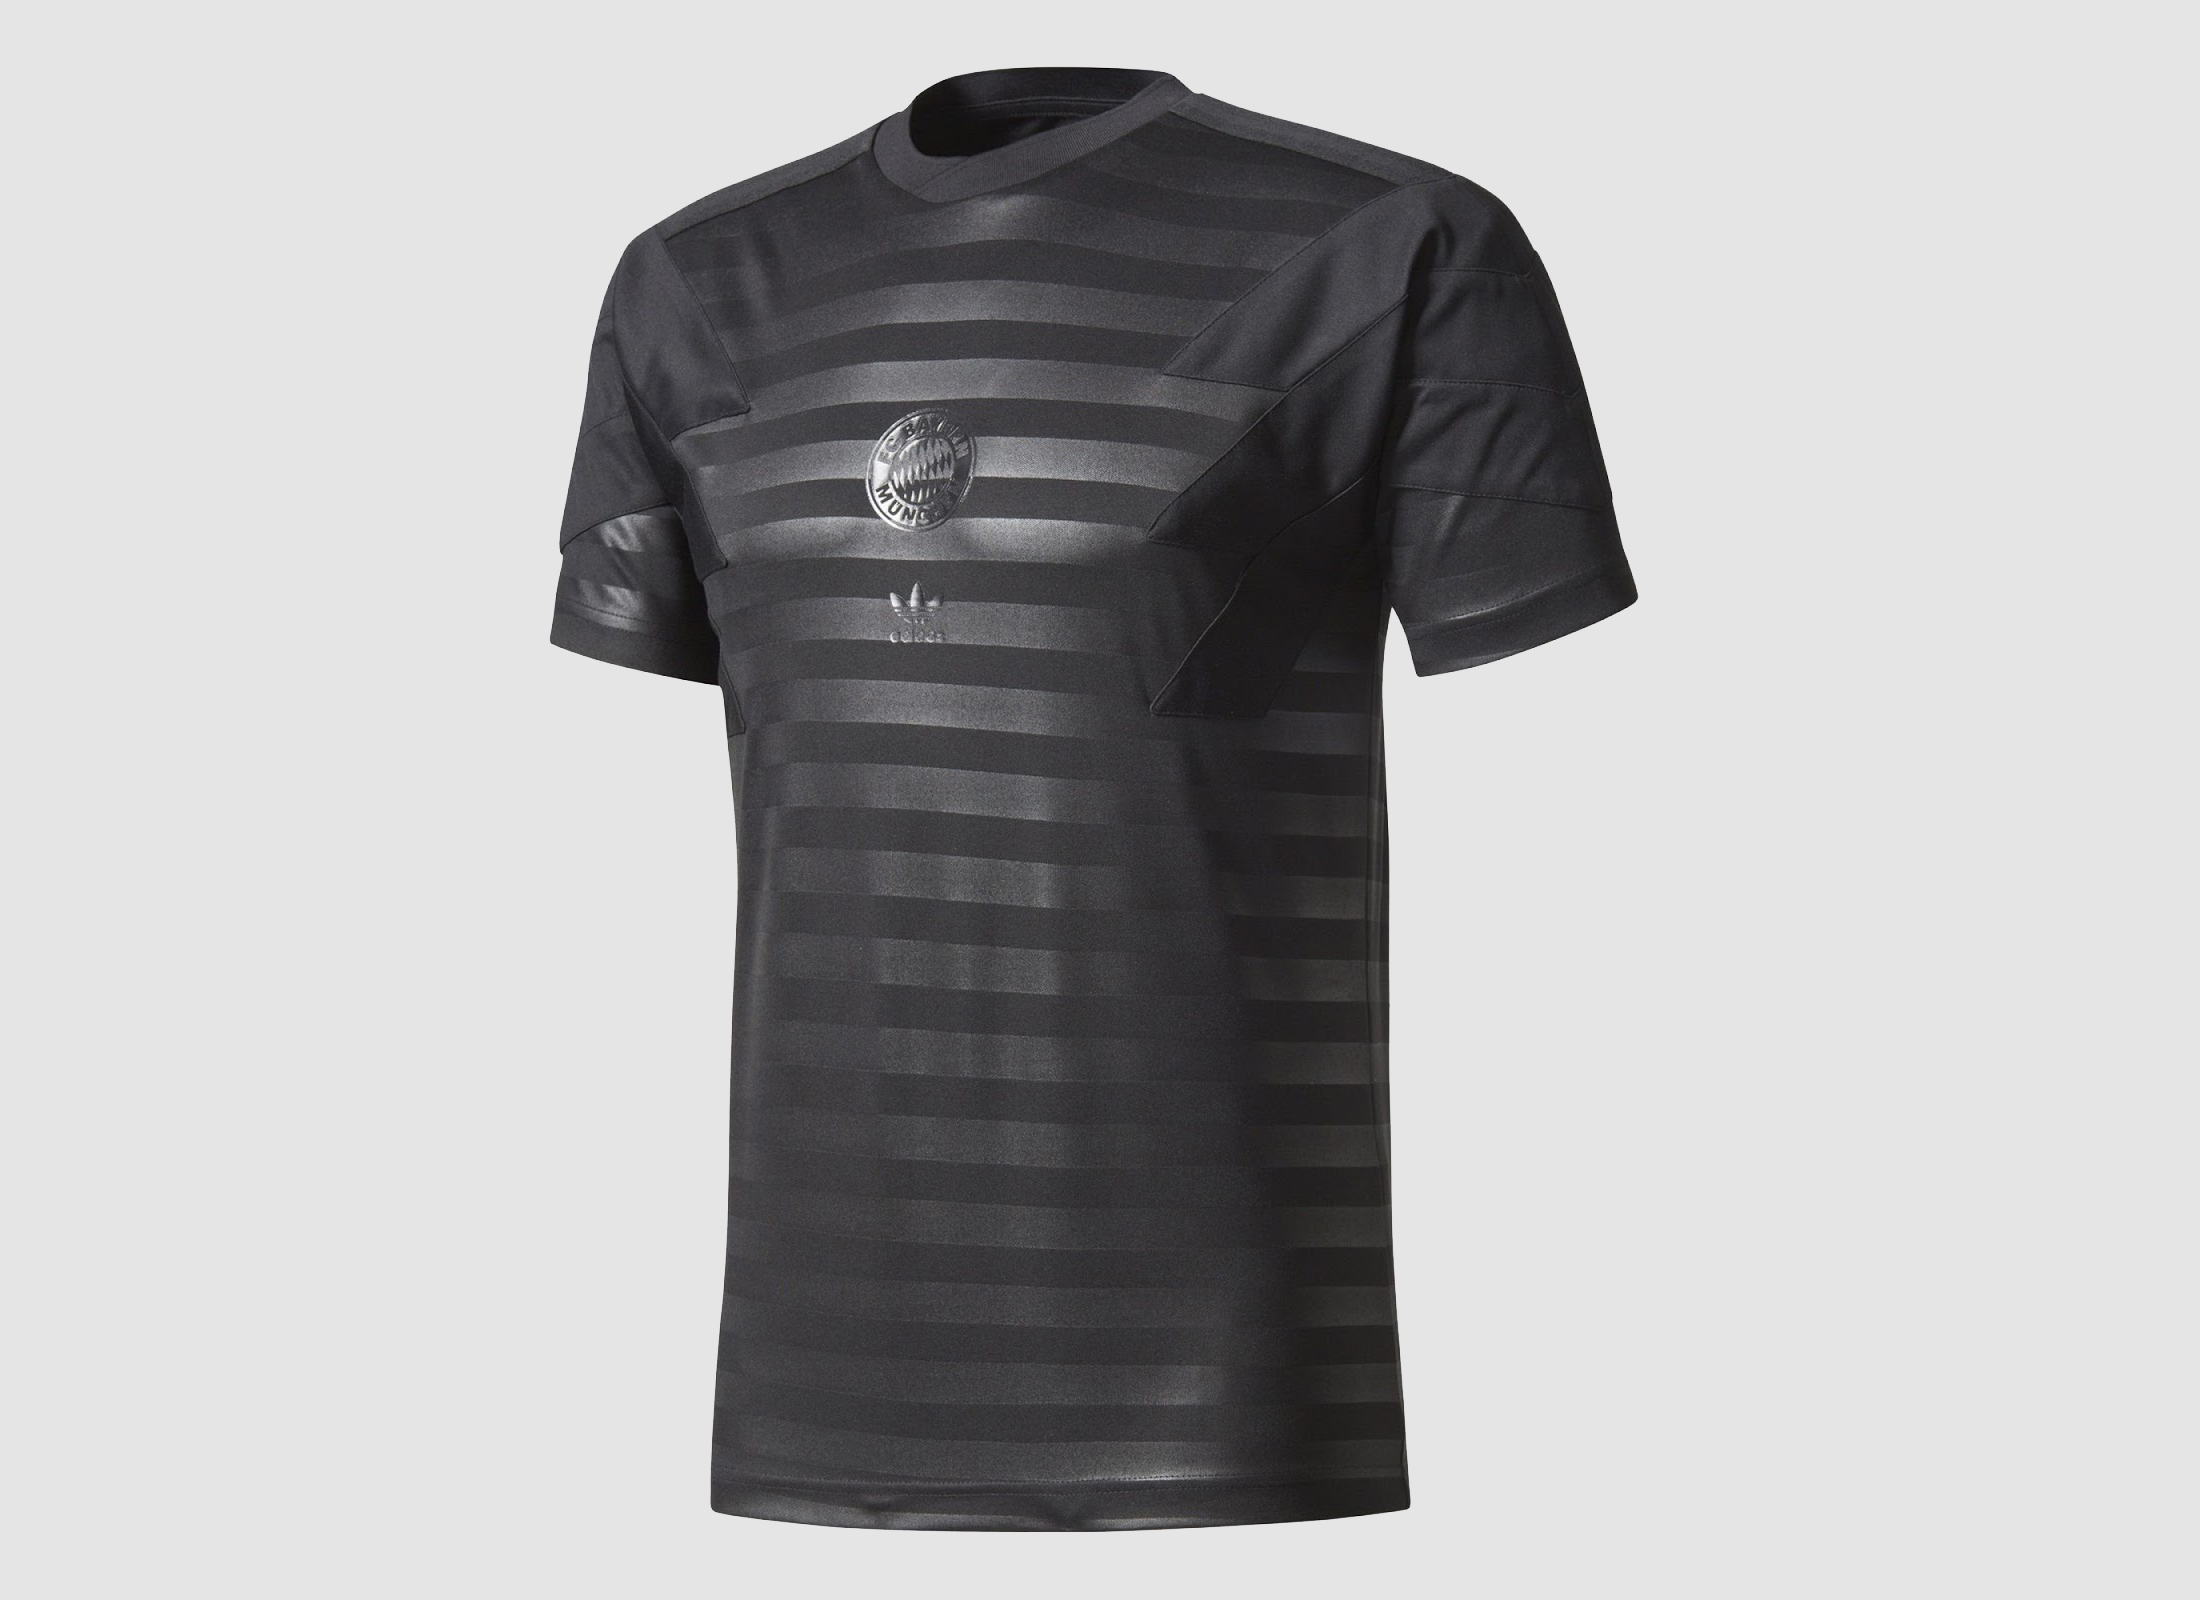 two-adidas-originals-bayern-munchen-2017-18-jerseys (11)